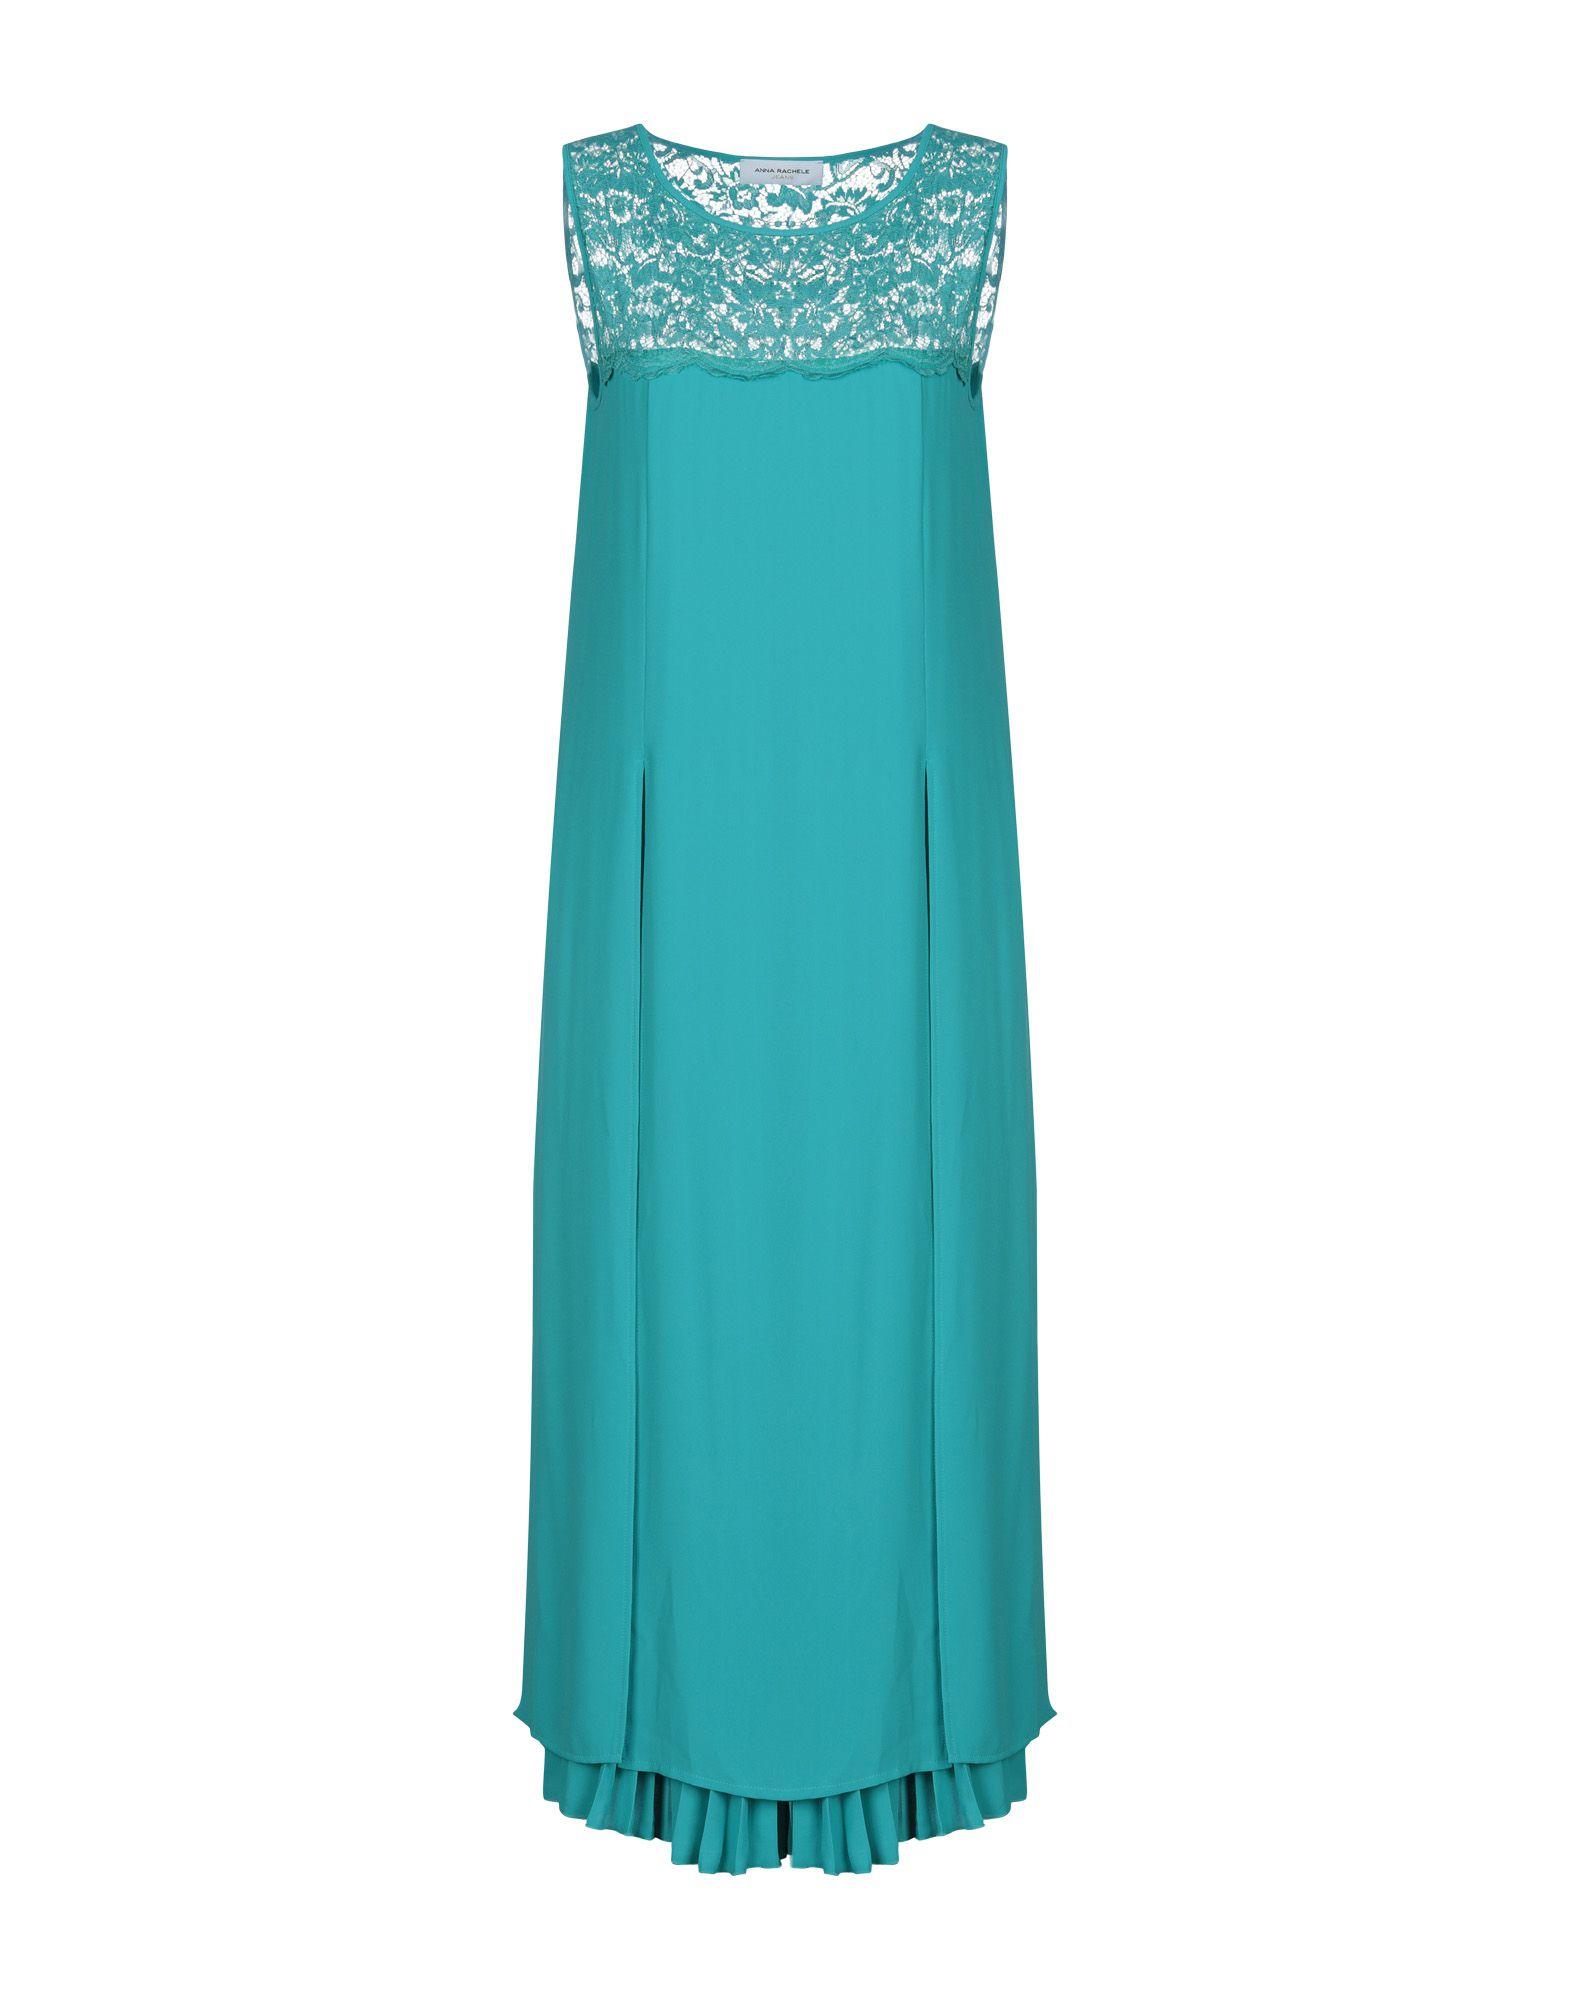 ANNA RACHELE JEANS COLLECTION Платье длиной 3/4 anna rachele jeans collection платье до колена